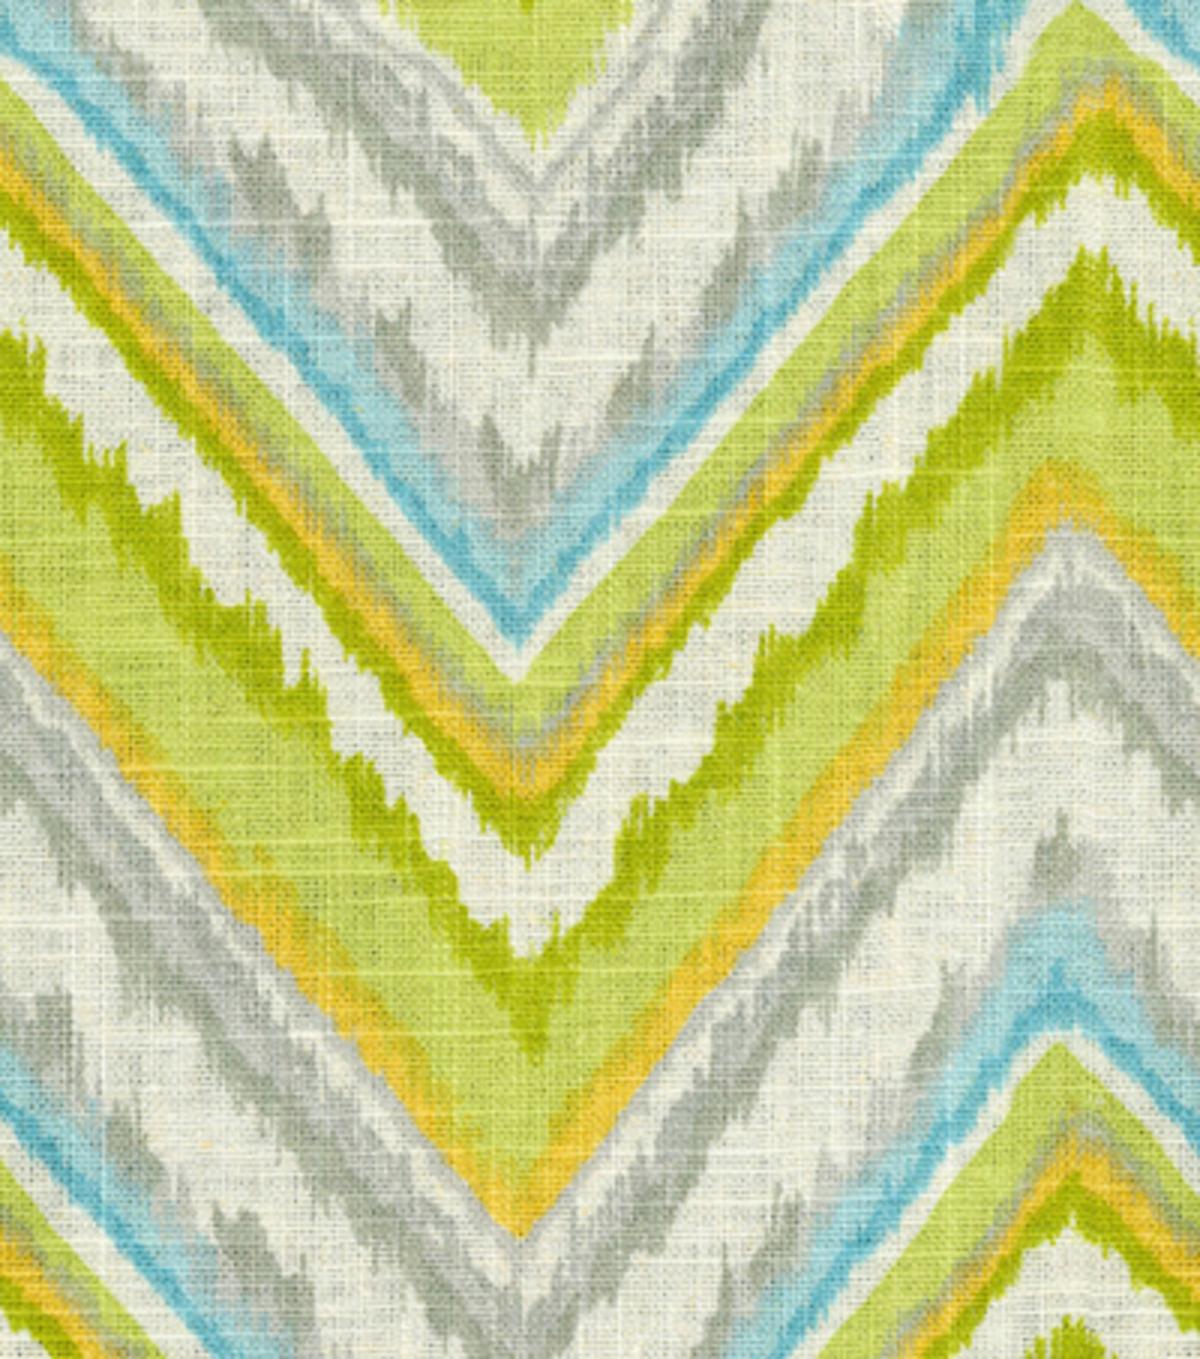 Jo Ann Fabrics And Crafts Mall: Home Decor Print Fabric- Dena Chevron Charade Citrus